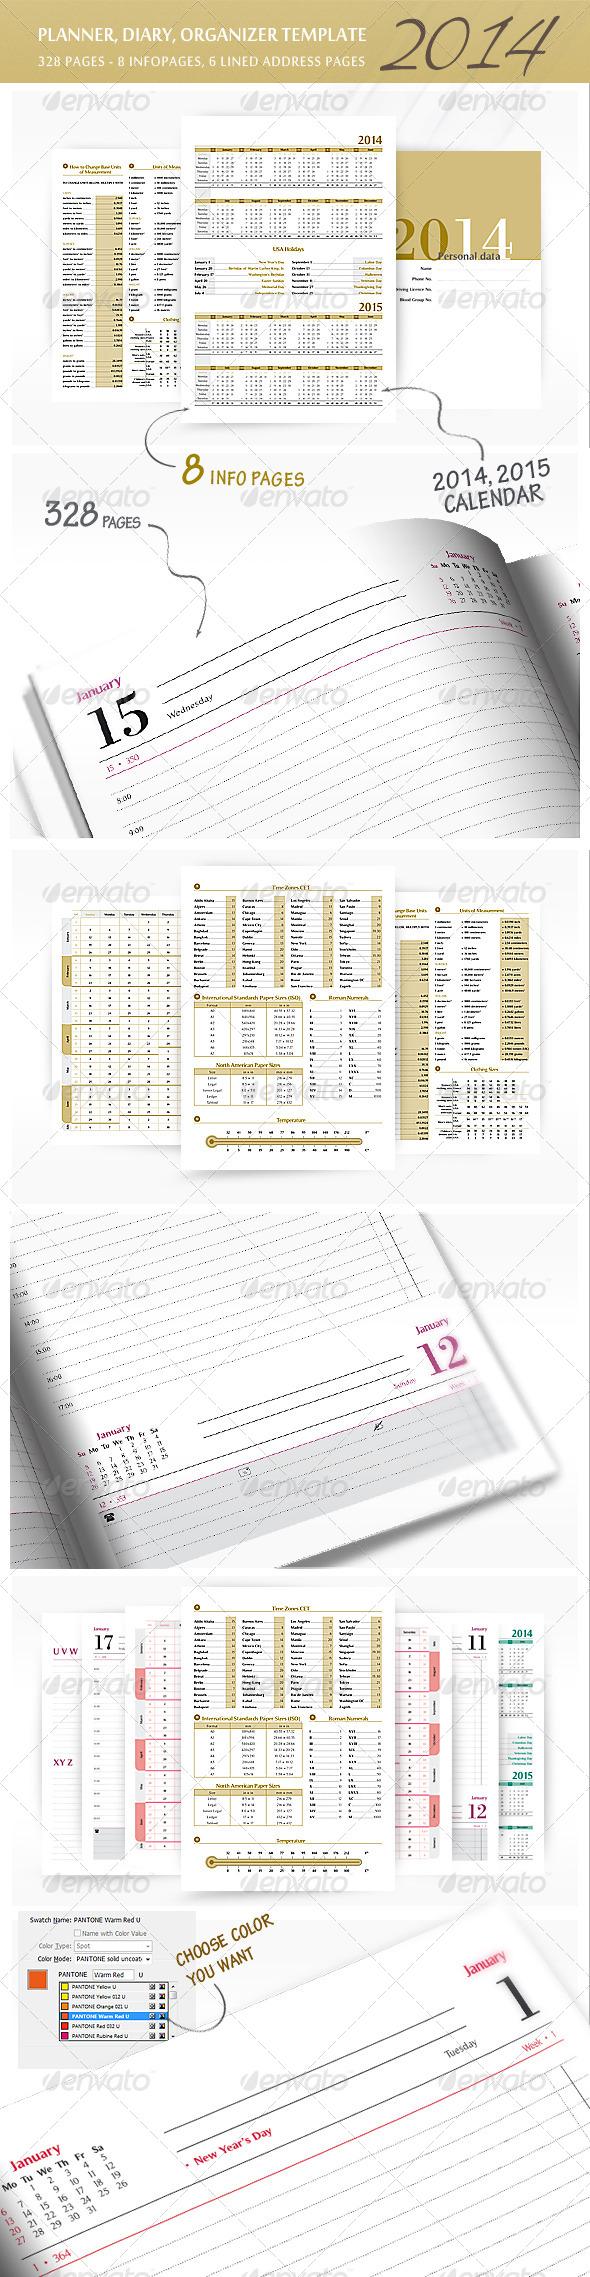 Planner-Diary-Organizer 2014 v2 - Calendars Stationery